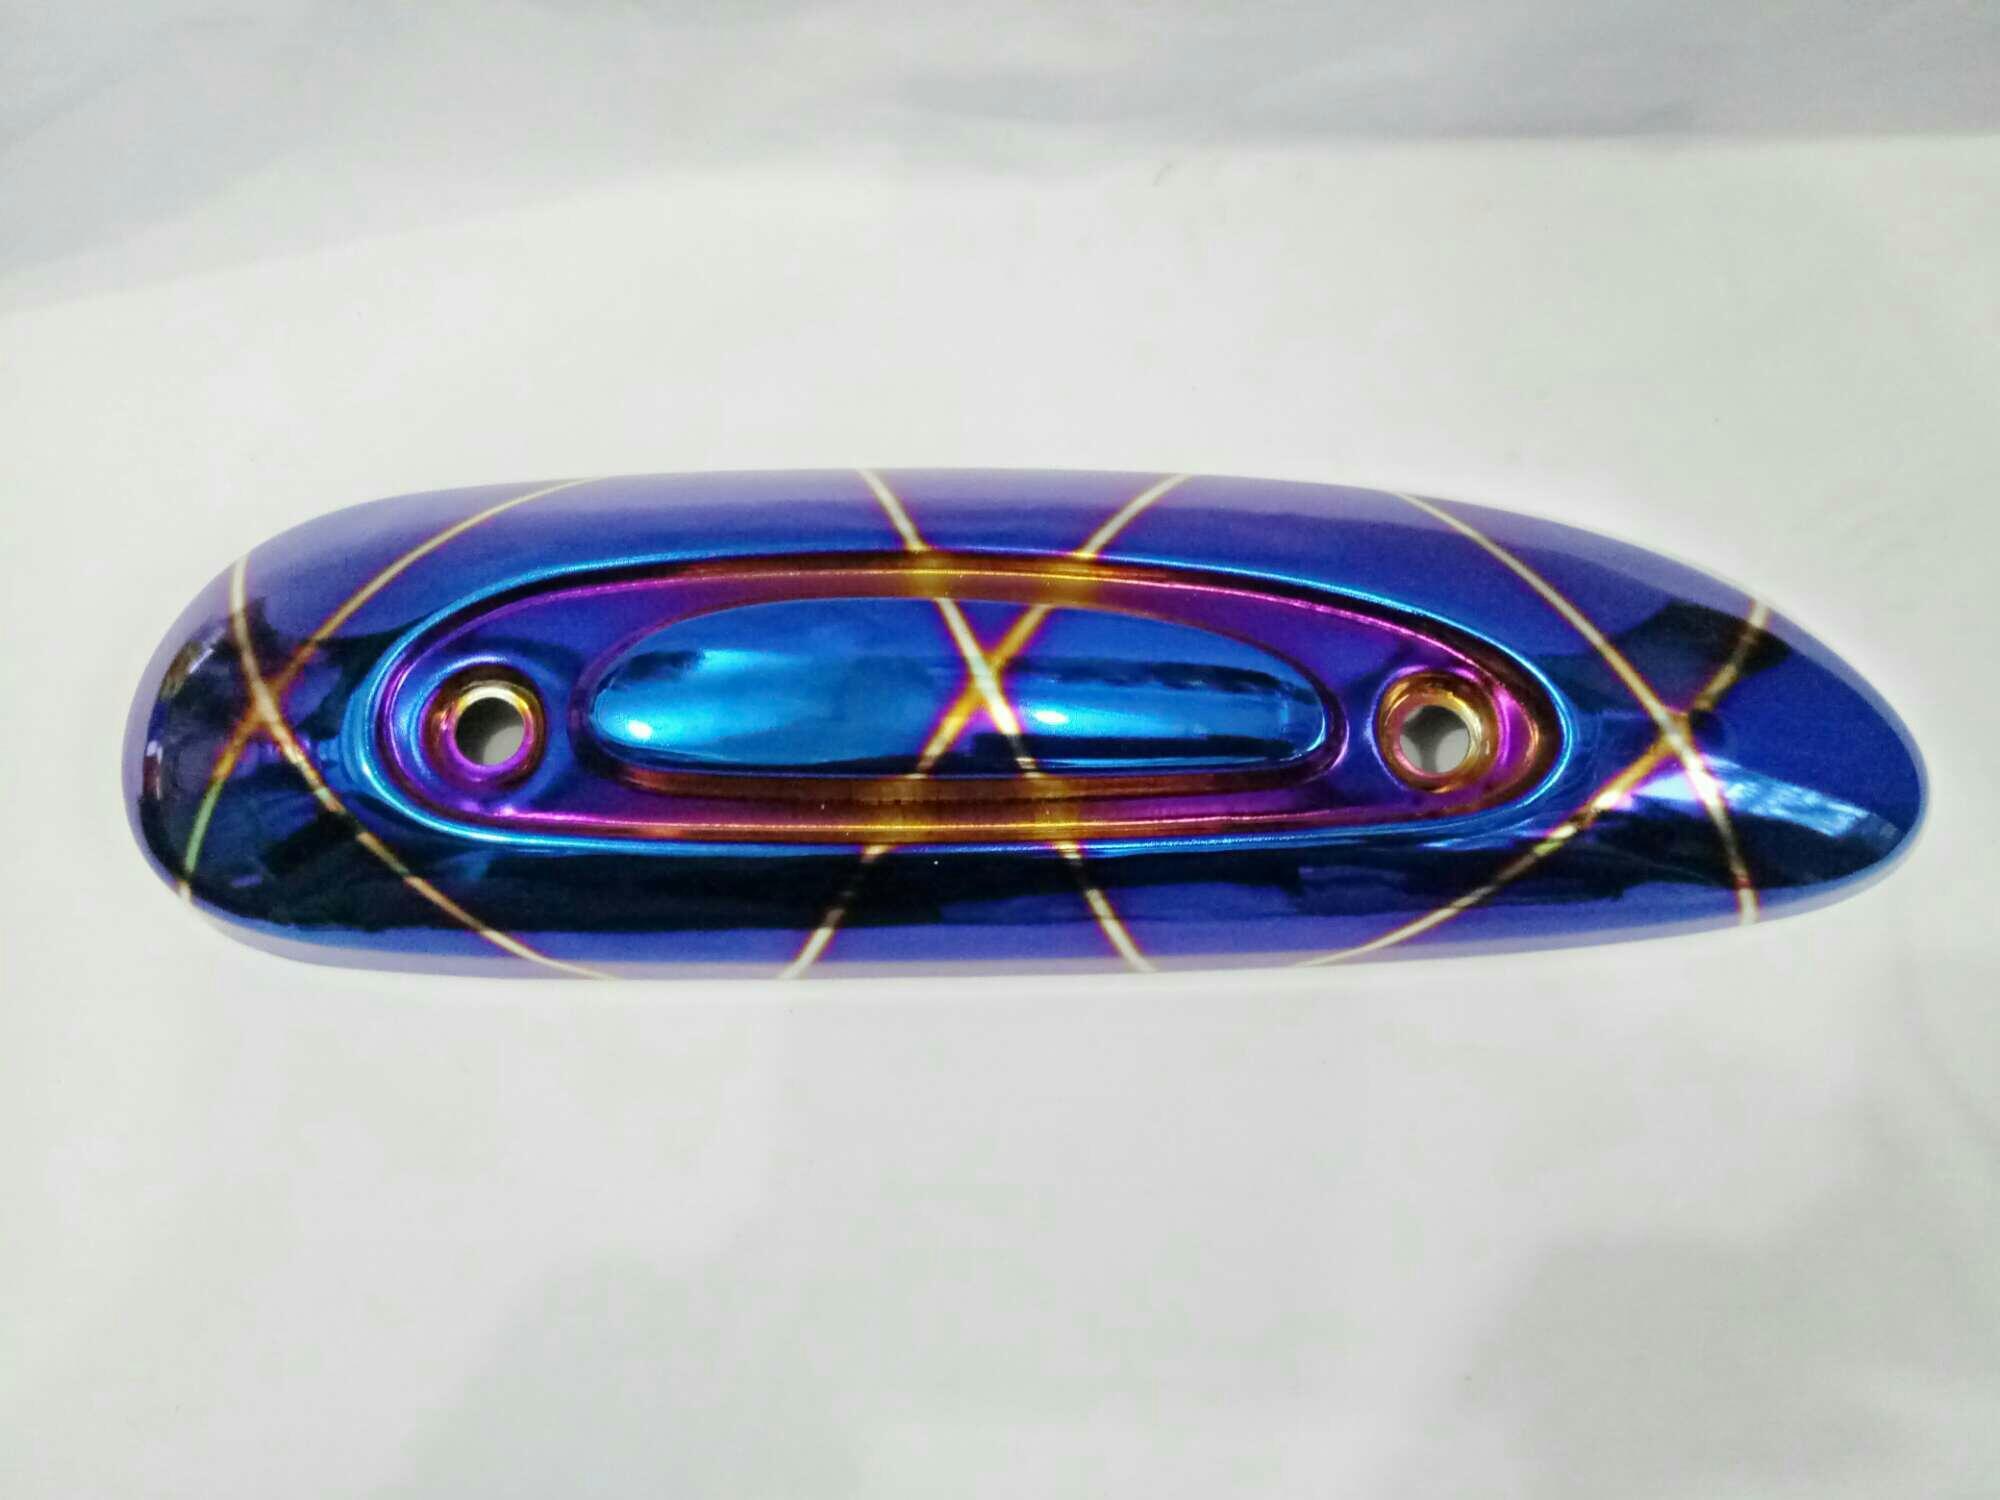 Kelebihan Tameng Cover Knalpot X Ride Pelindung Yamaha Prospeed Sx Series Xride Red Full Scoopy Blue Made In Thailand